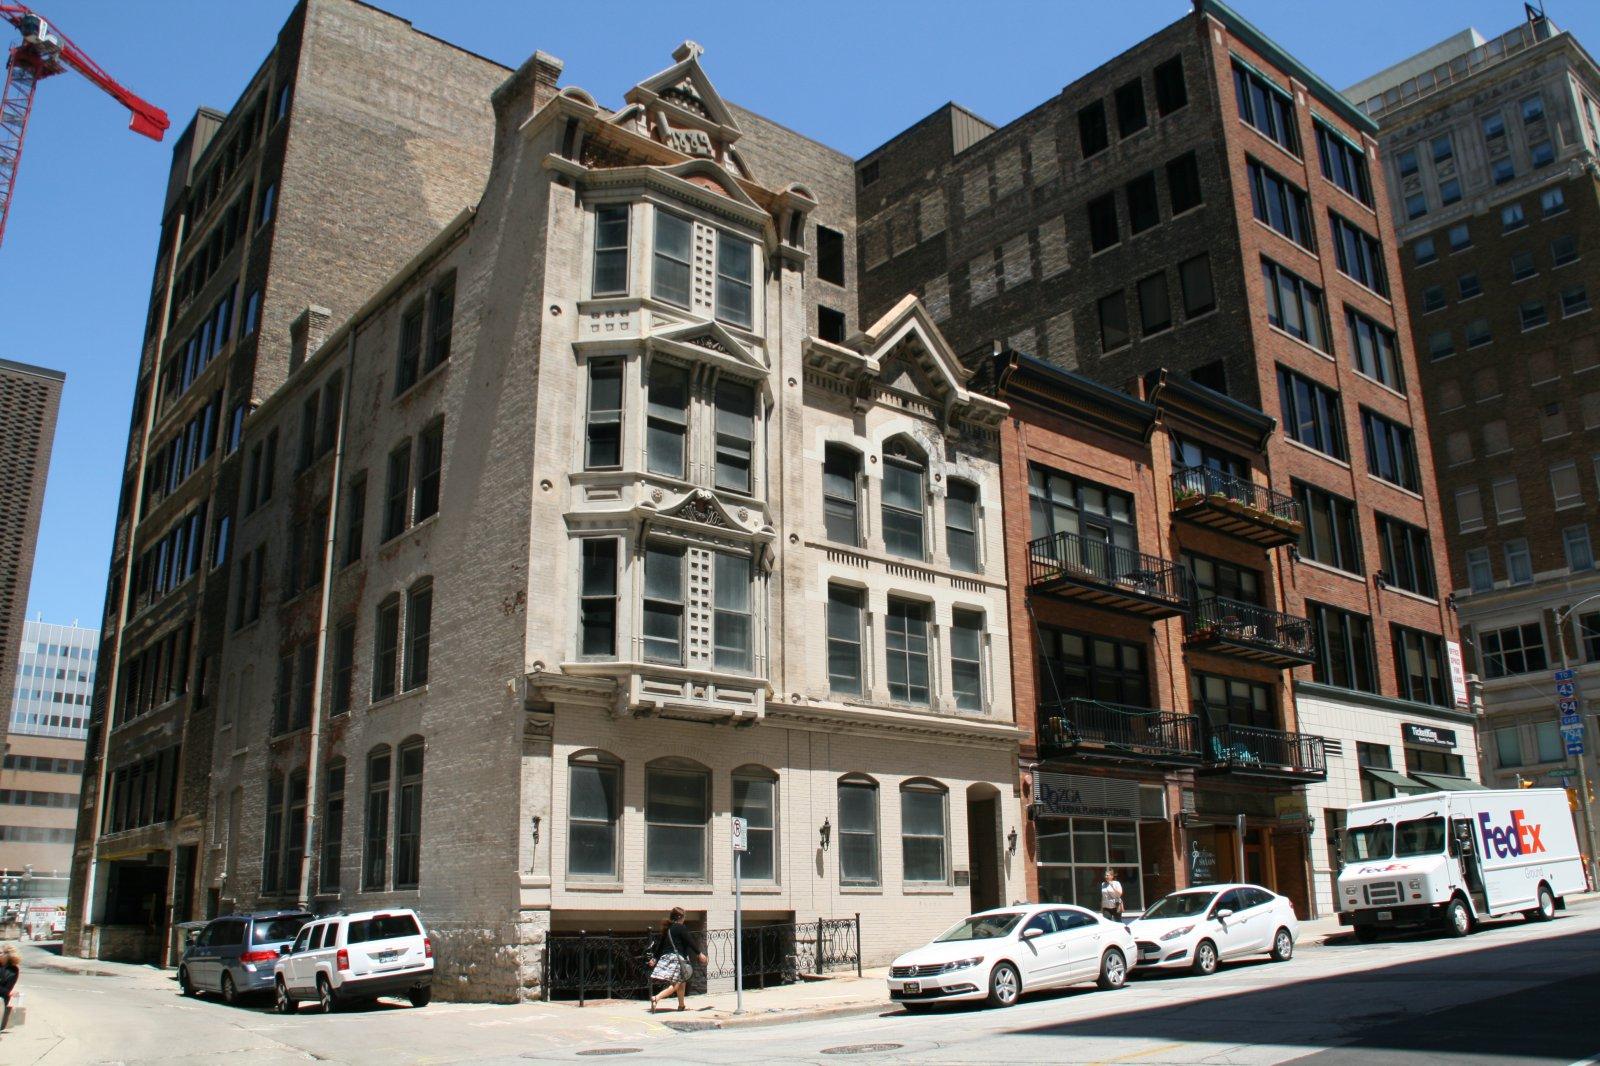 Milwaukee Abstract Association Building and Milwaukee News Building